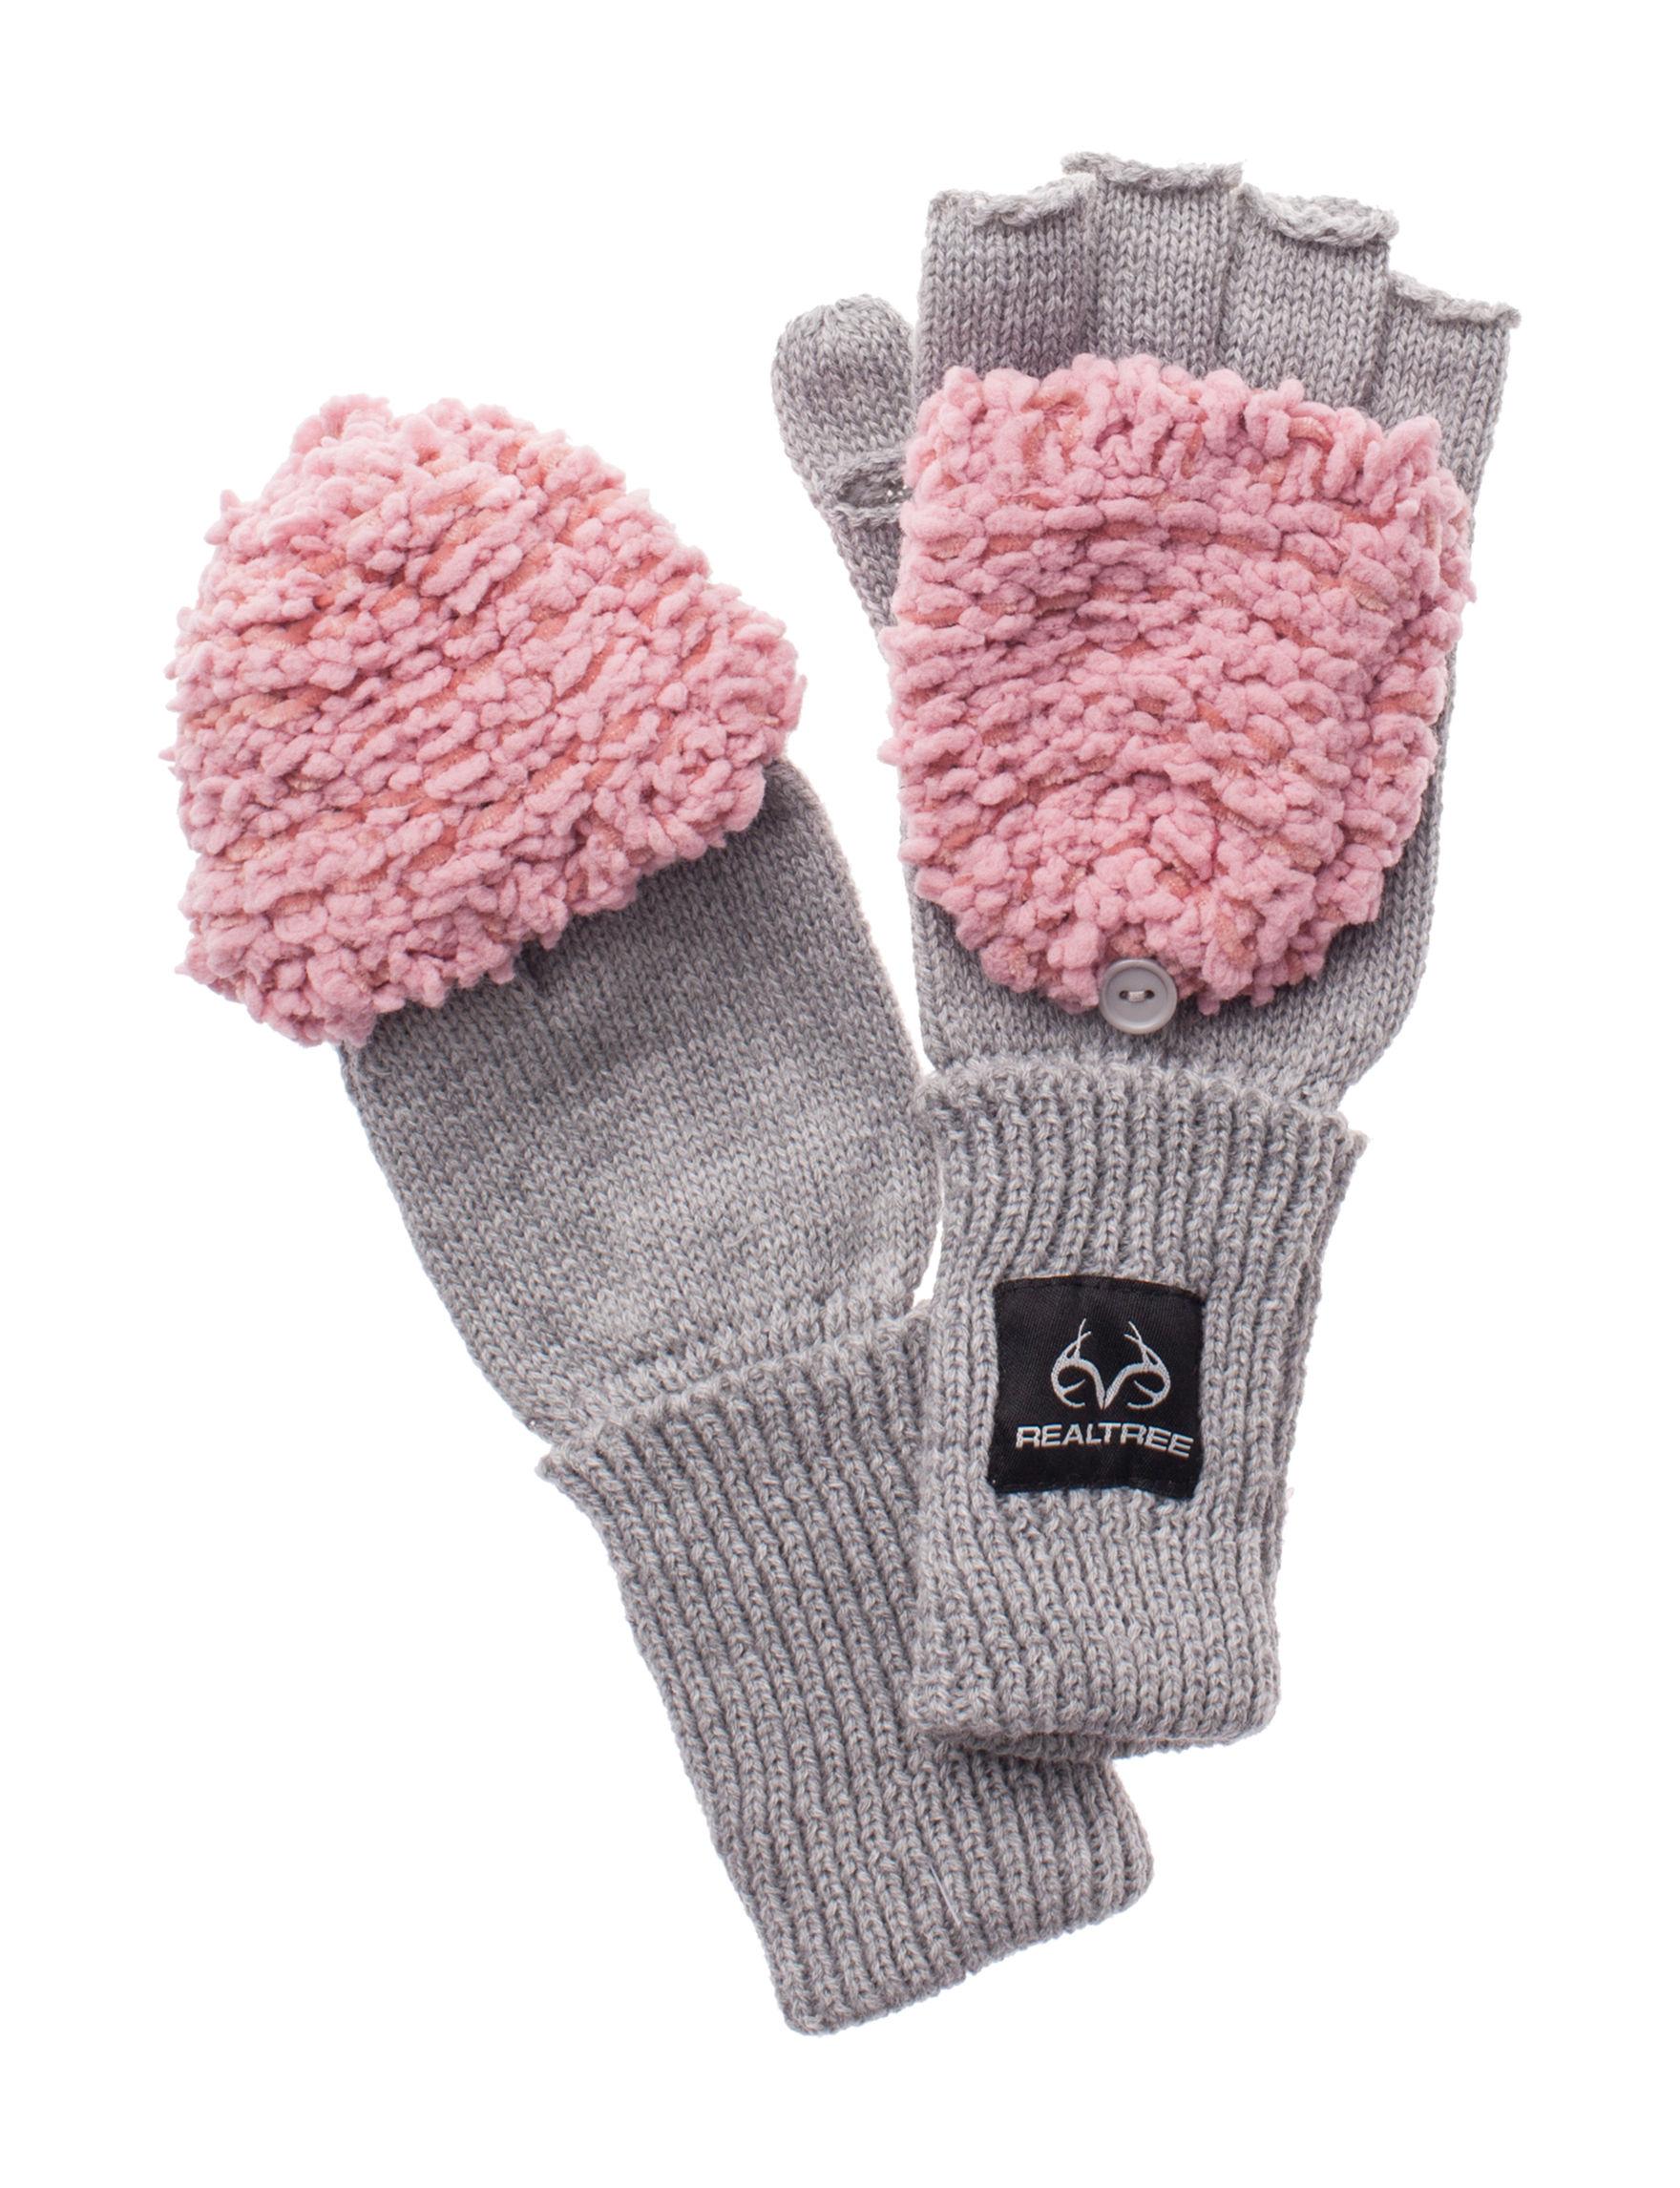 Realtree Ivory / Black Gloves & Mittens